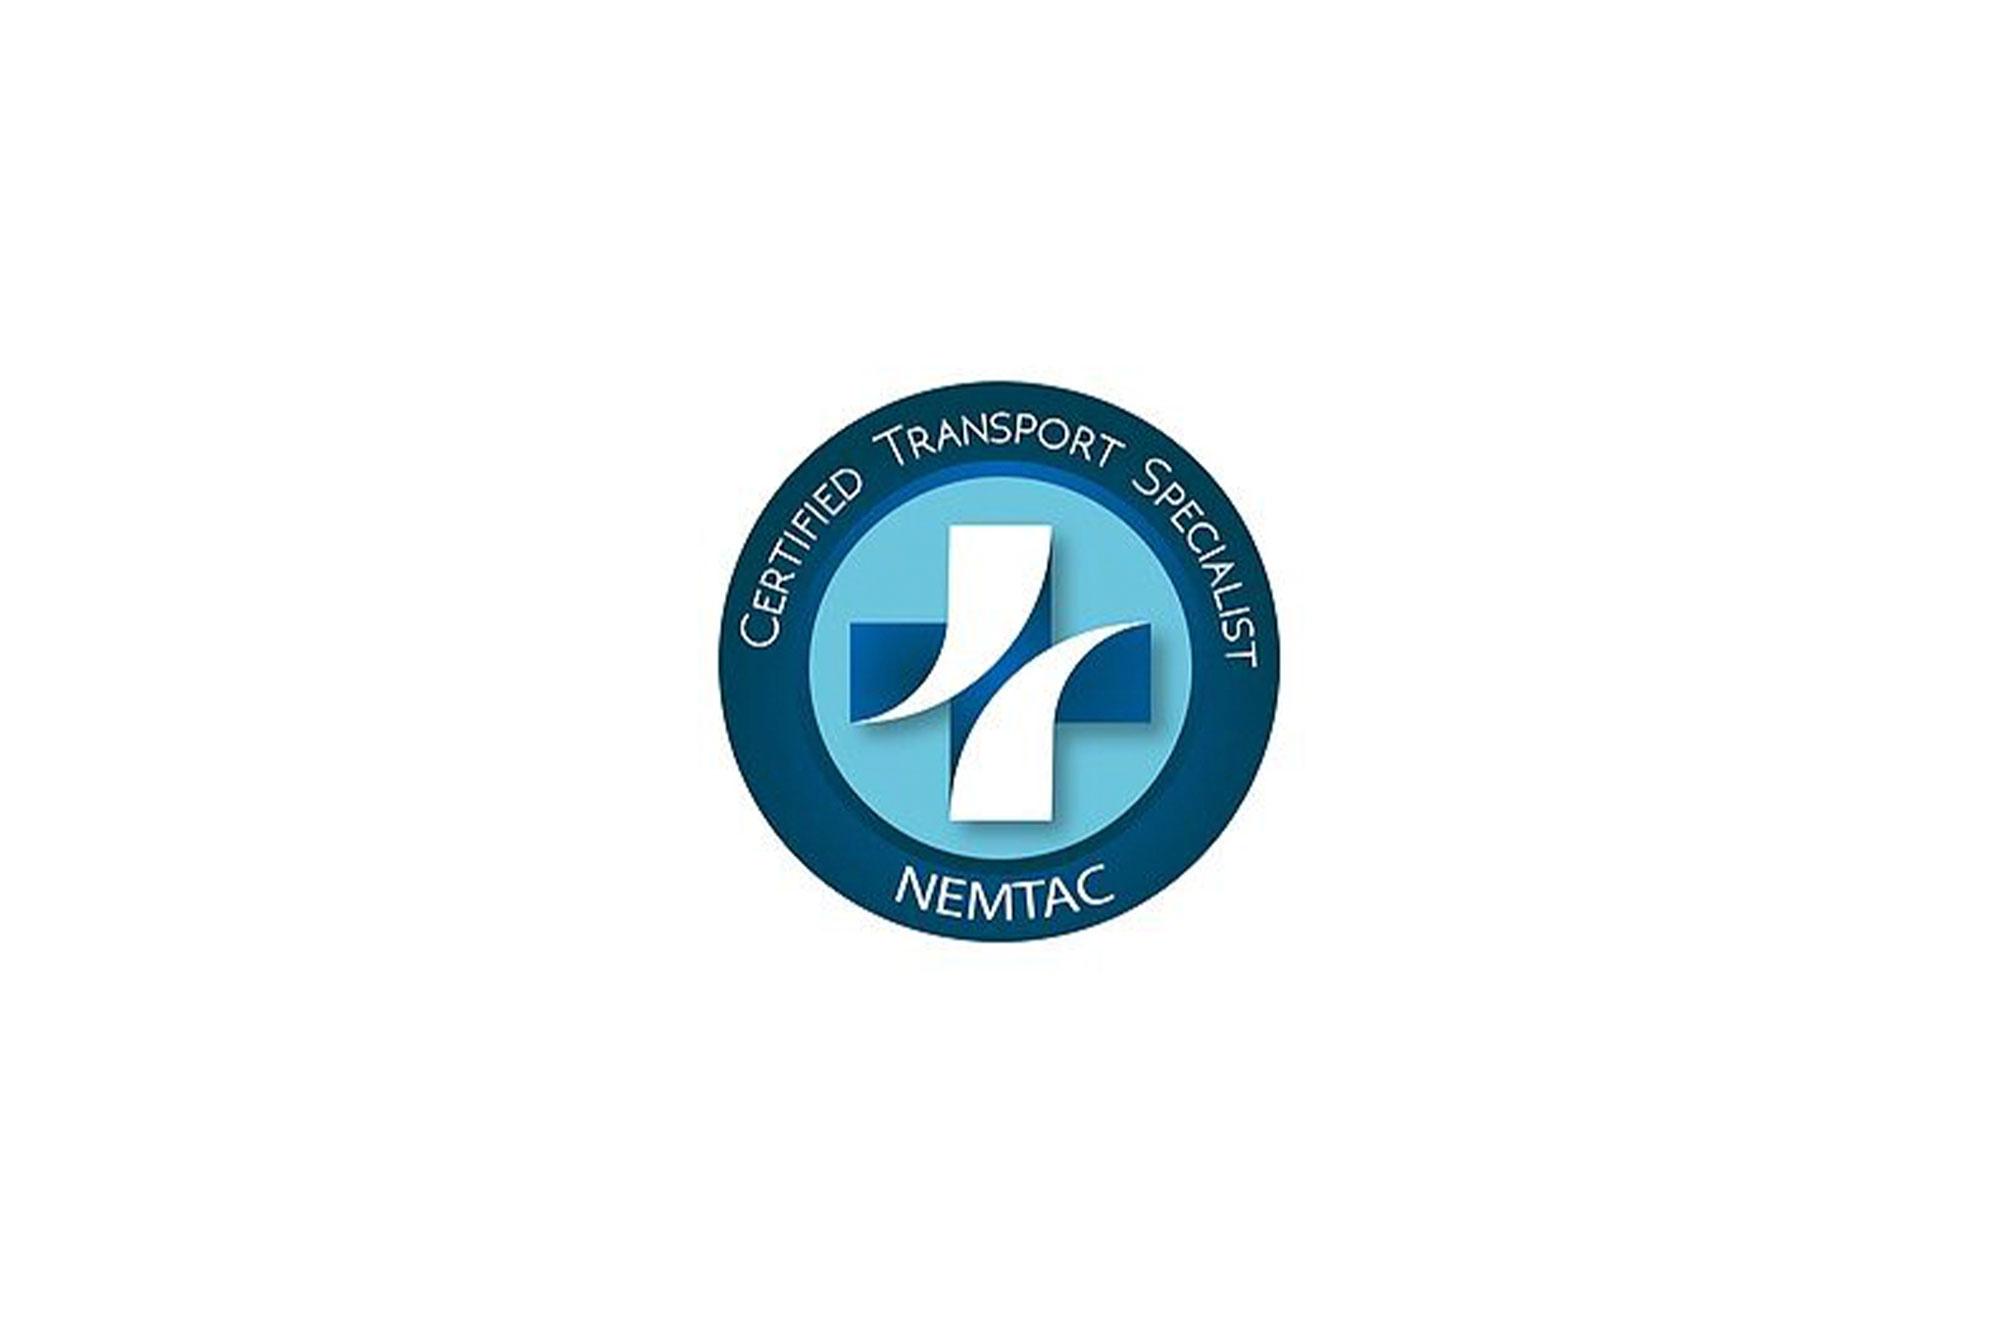 Non-Emergency Medical Transportation Accreditation Commission (NEMTAC) Certification